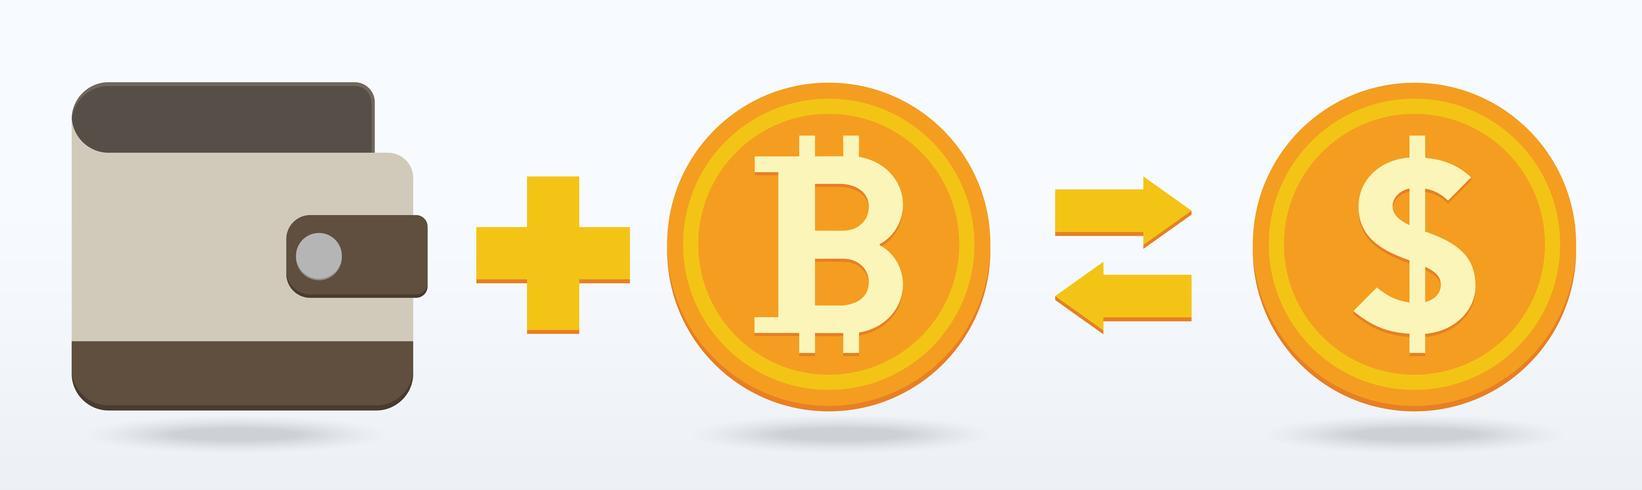 Bitcoin flaches Design, digitale oder virtuelle Münze vektor